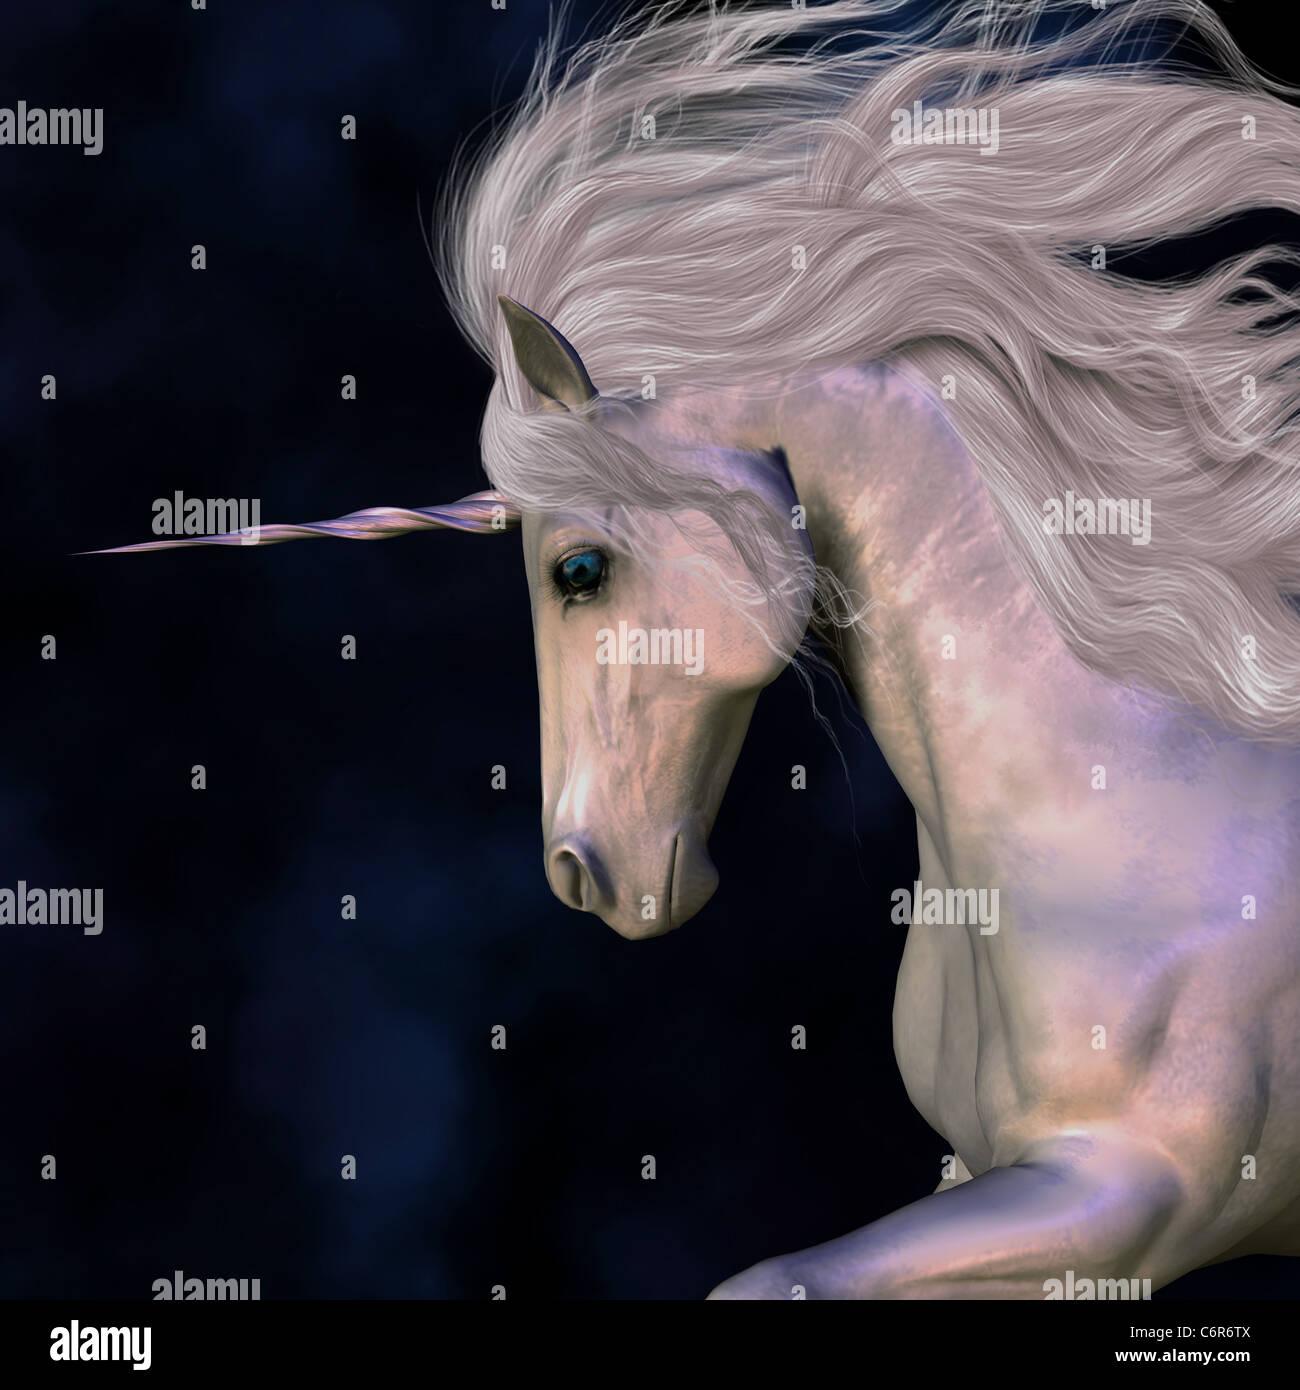 A white buck unicorn's horn has a beautiful pink glow. - Stock Image